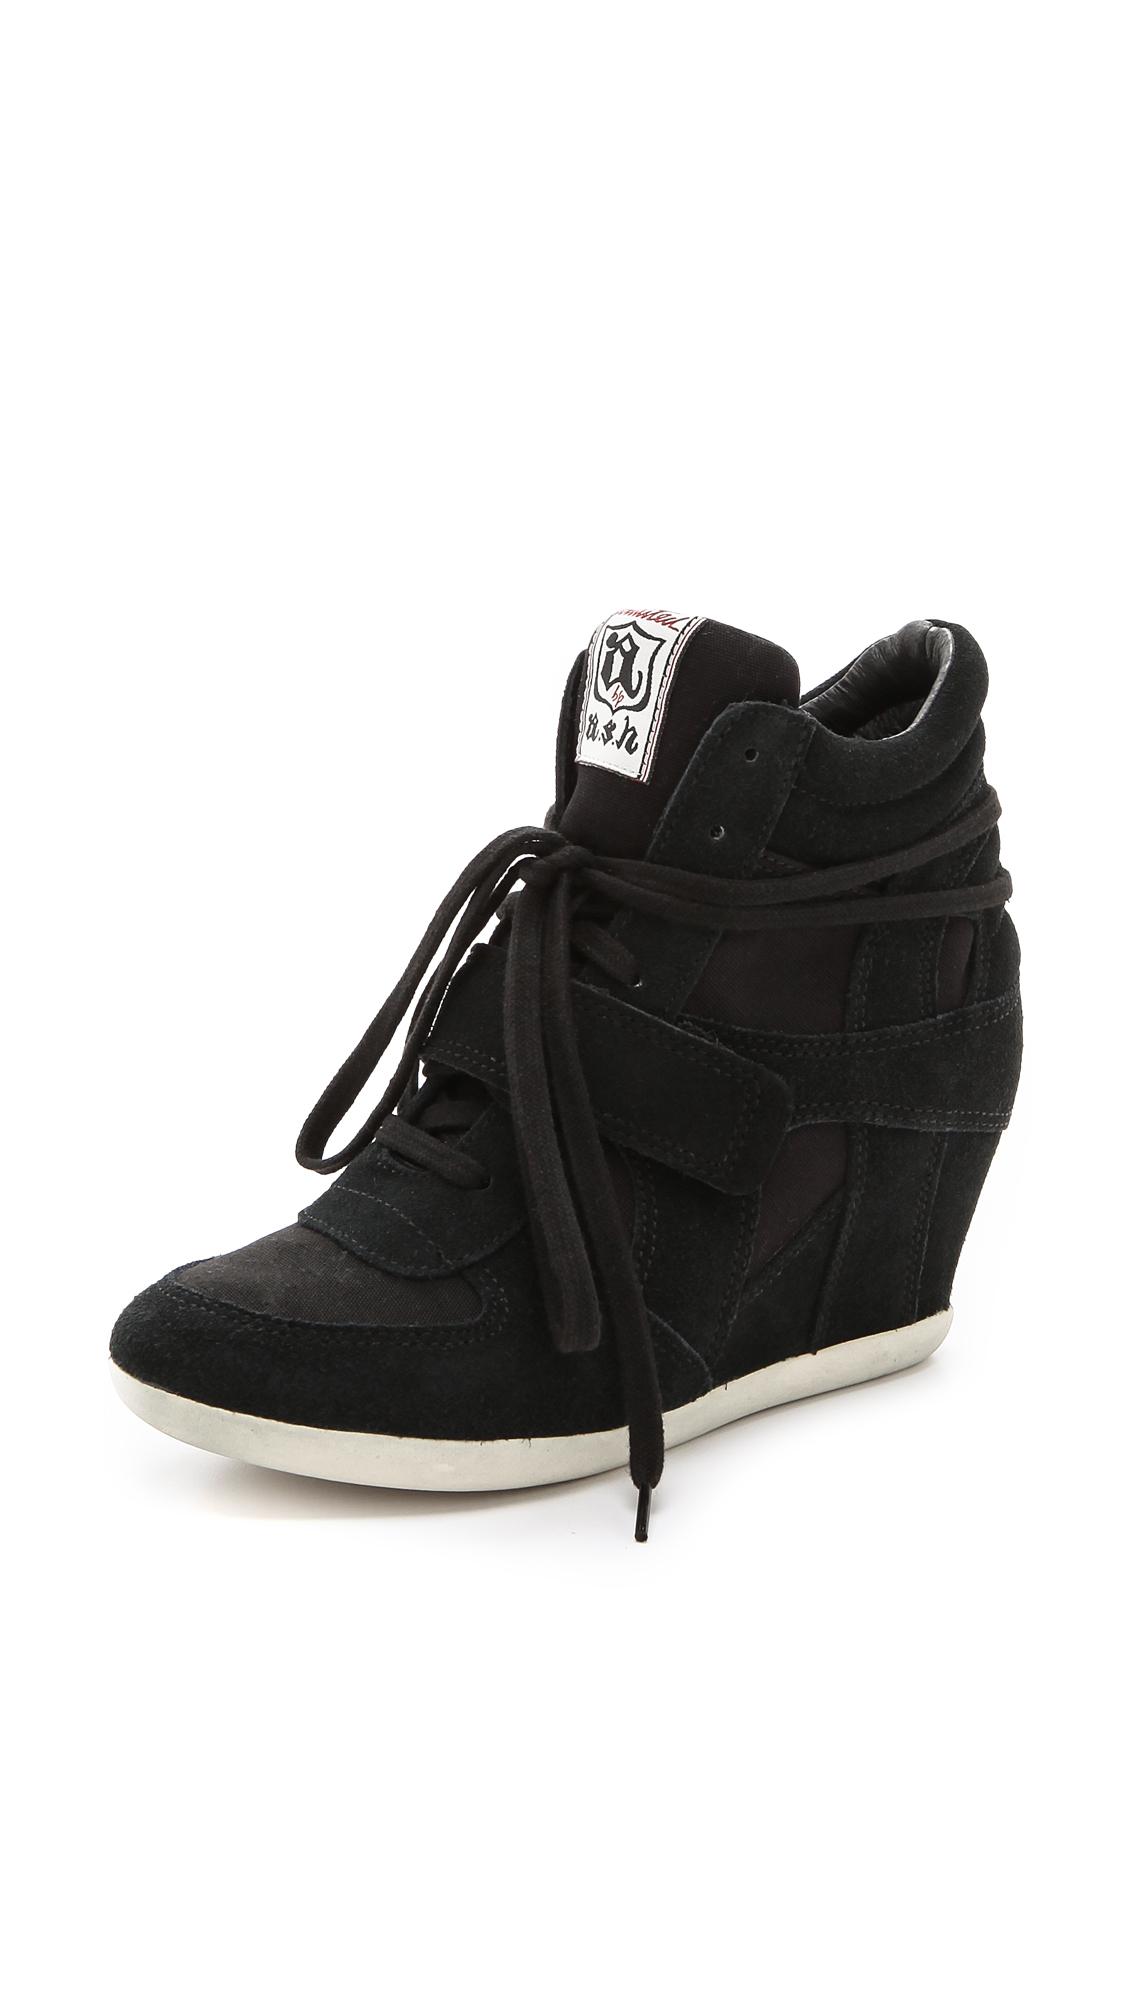 Ash Shoes Uk Size